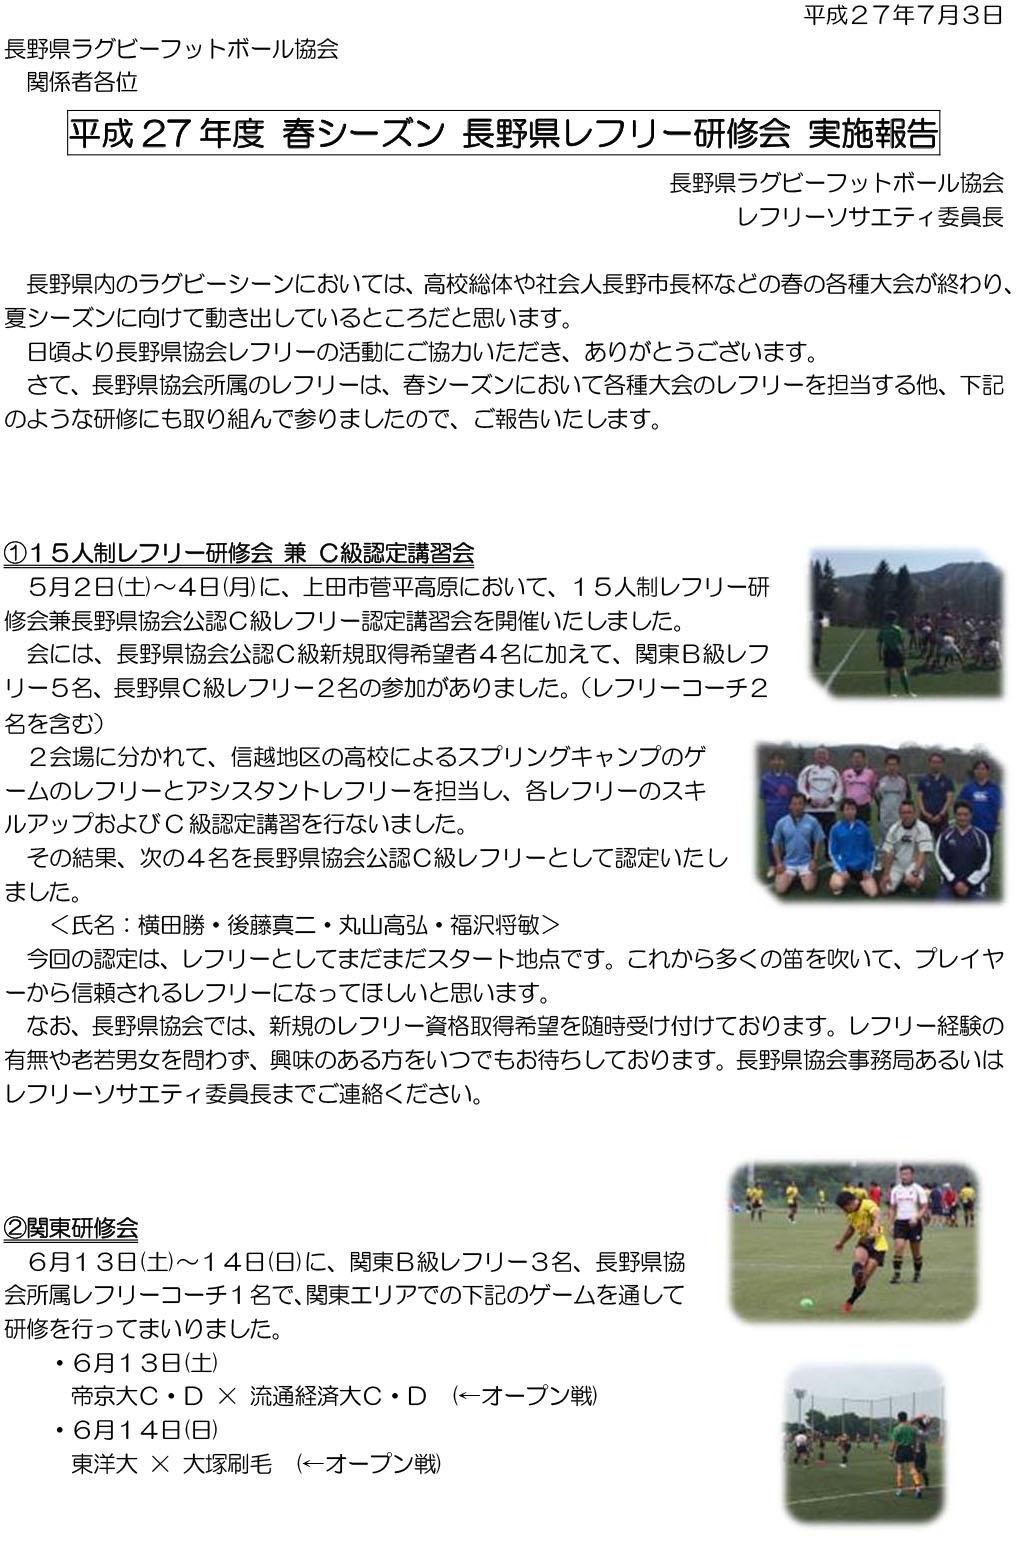 2015-Referee-spring-training-report-1.jpg